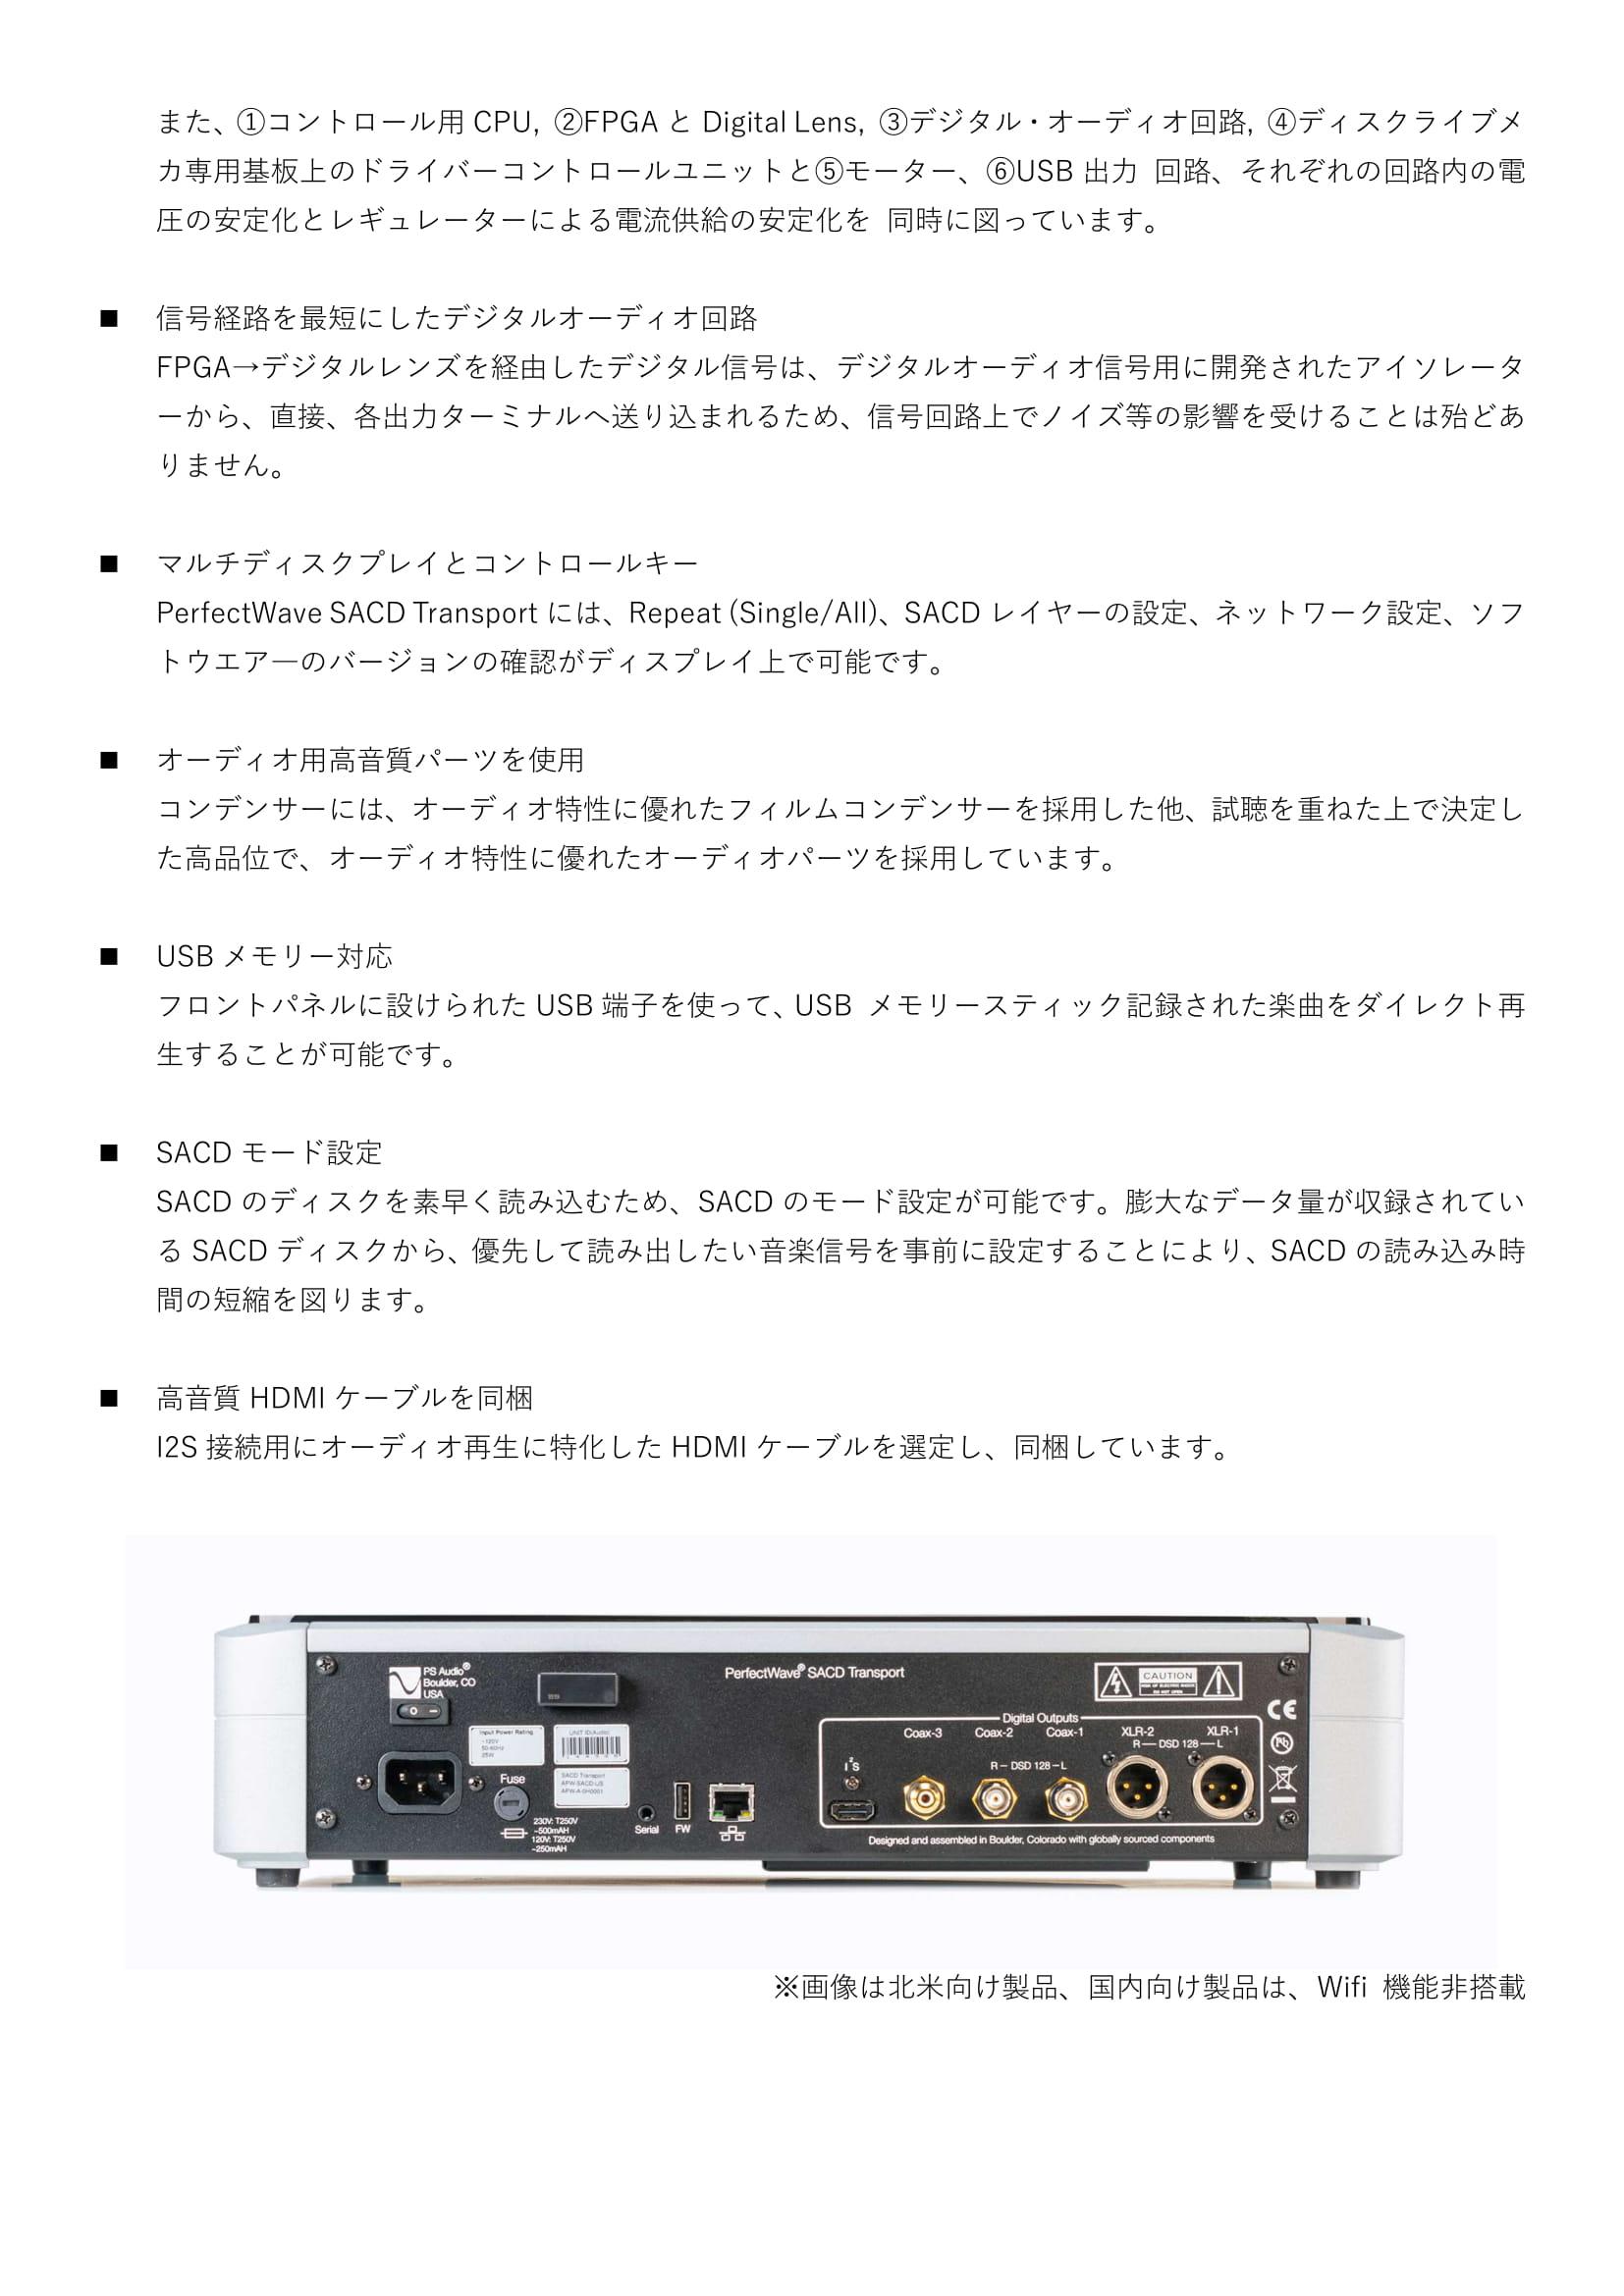 PW-SACDT_20210323-3.jpg